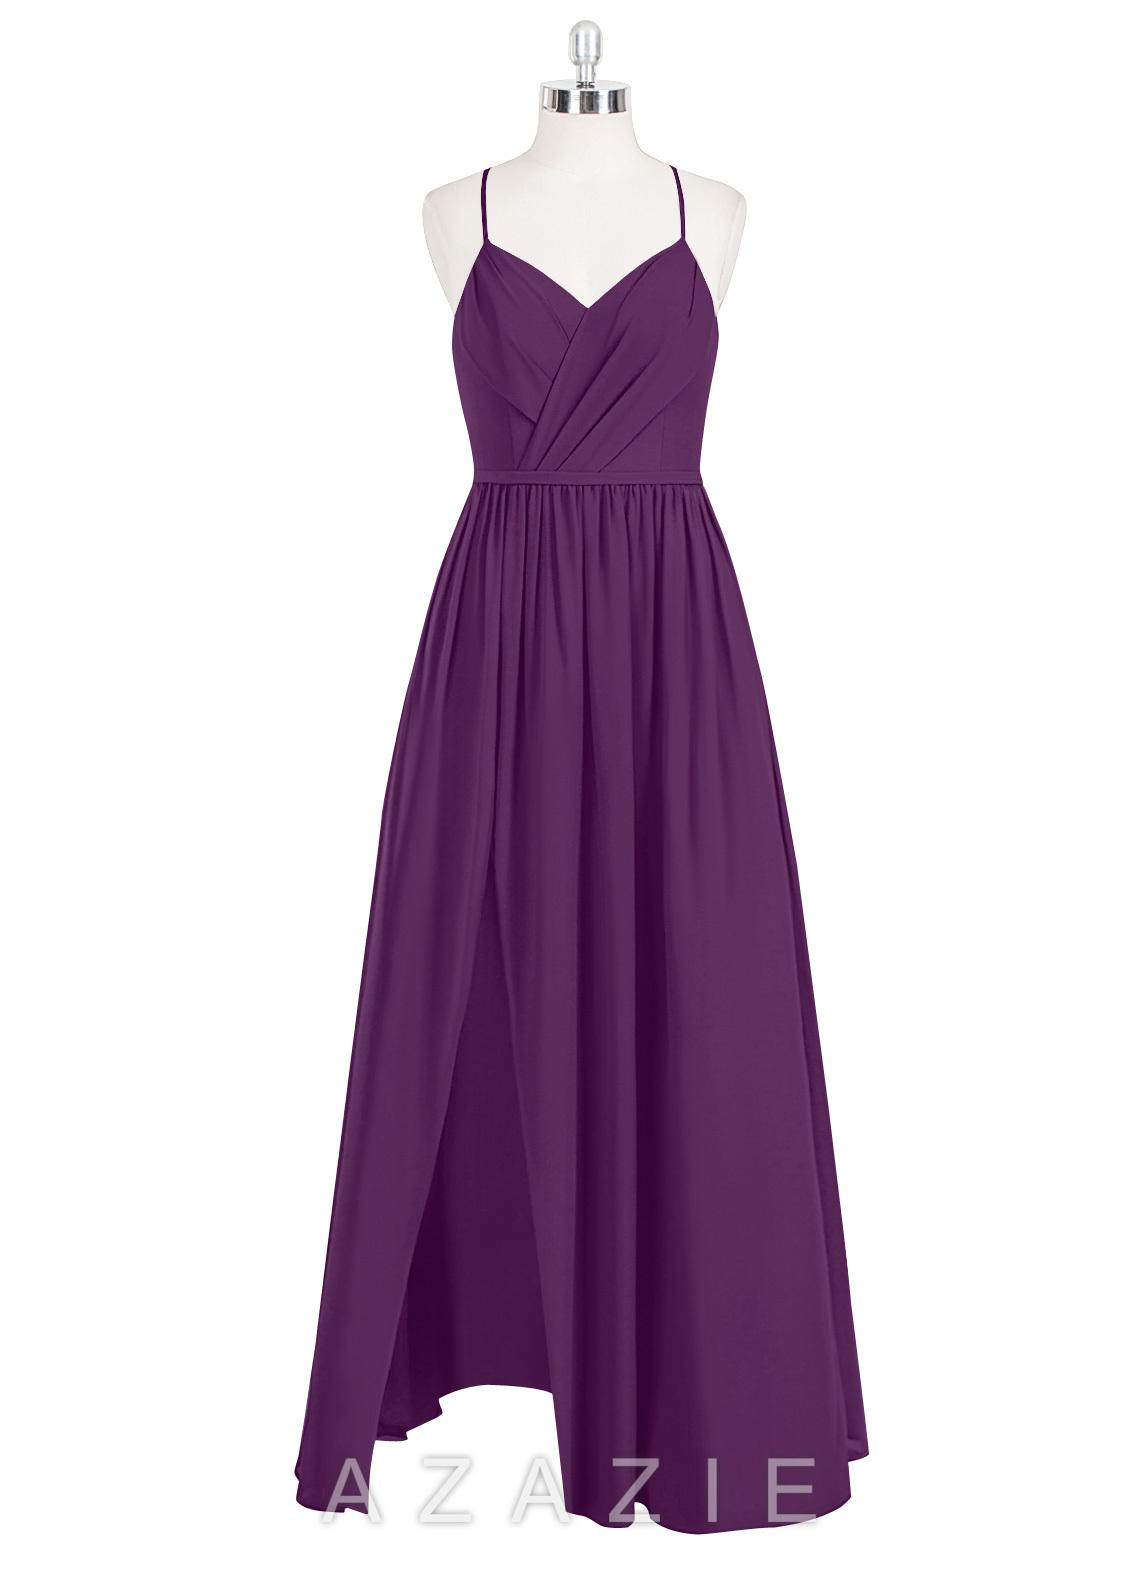 Azazie Cora Bridesmaid Dress Azazie